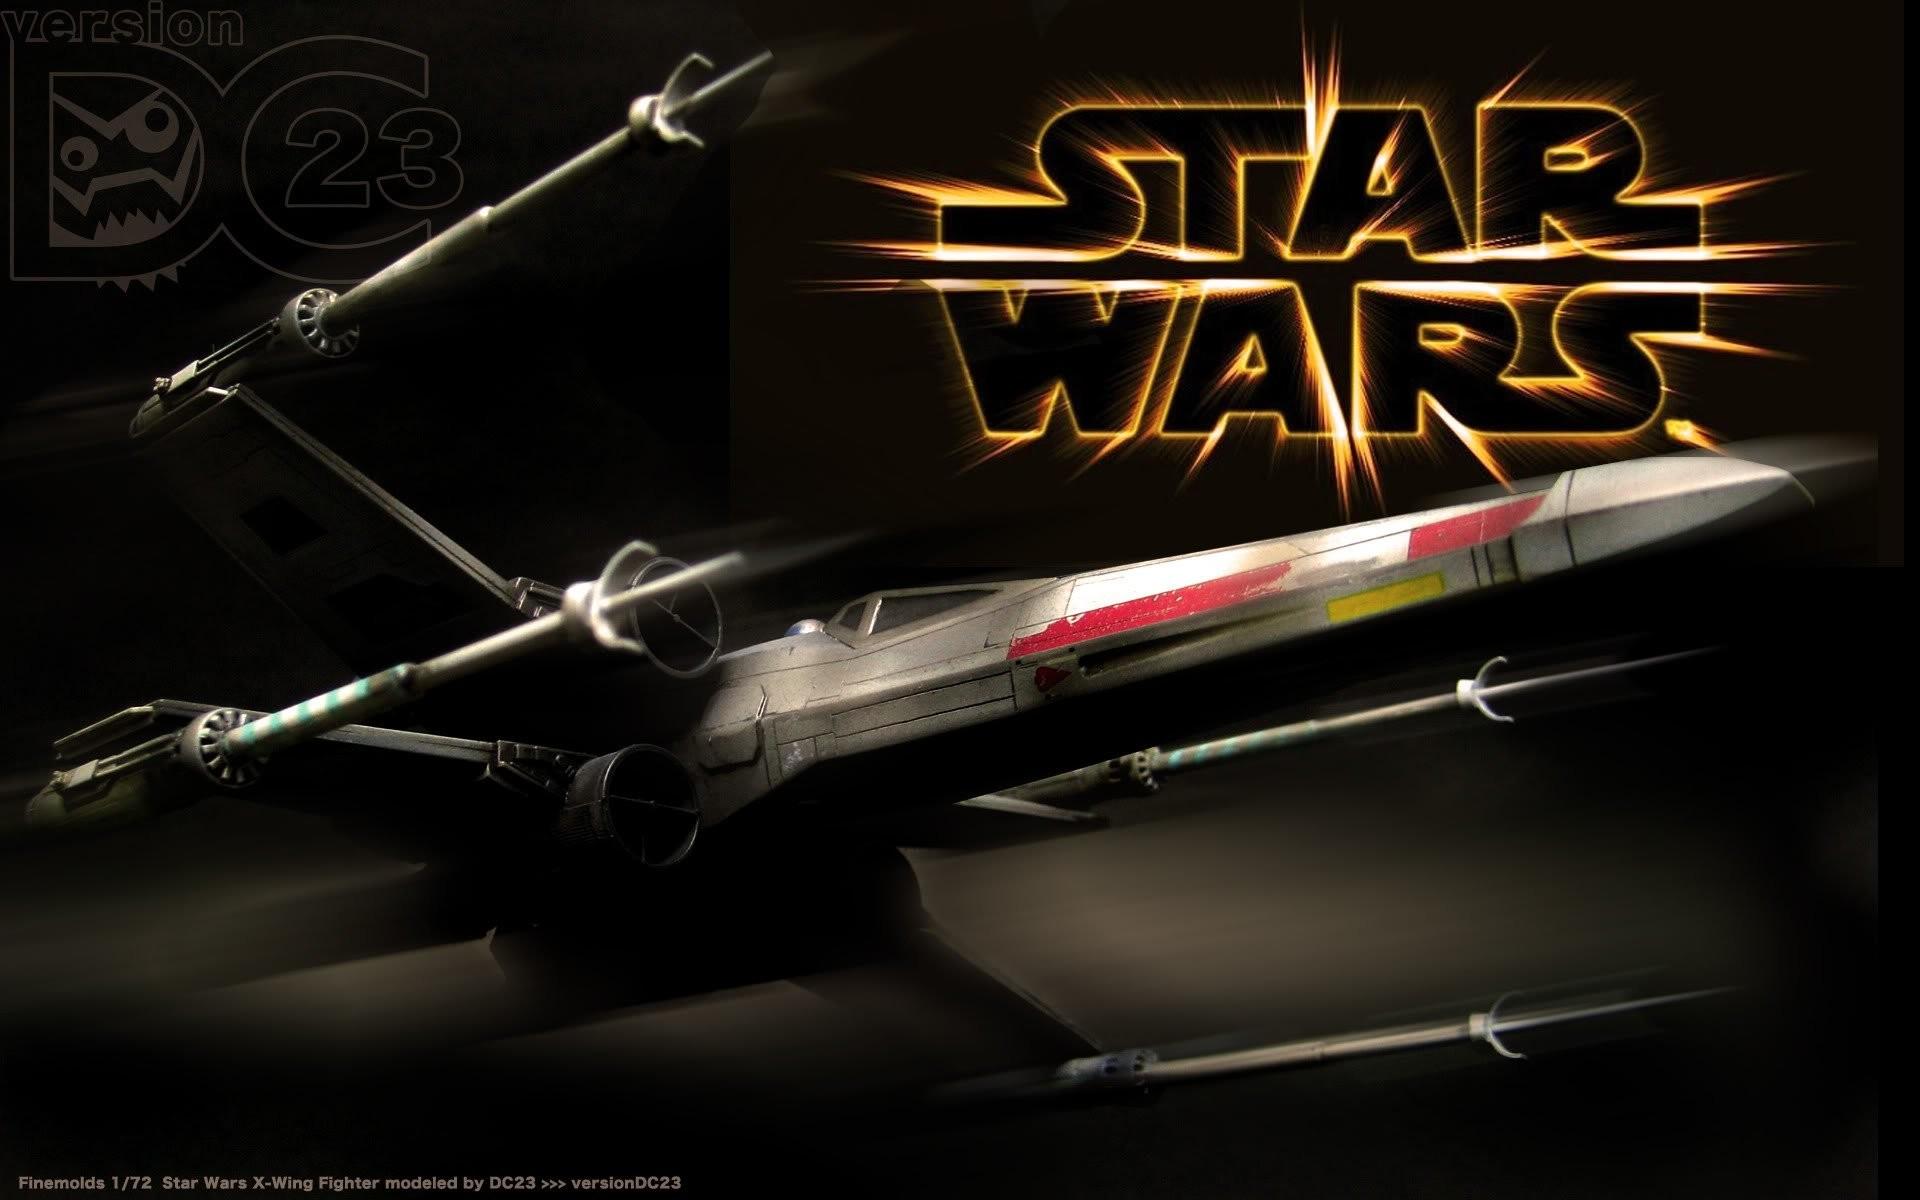 STAR WARS X -WING spaceship futuristic space sci-fi xwing wallpaper |  | 811229 | WallpaperUP